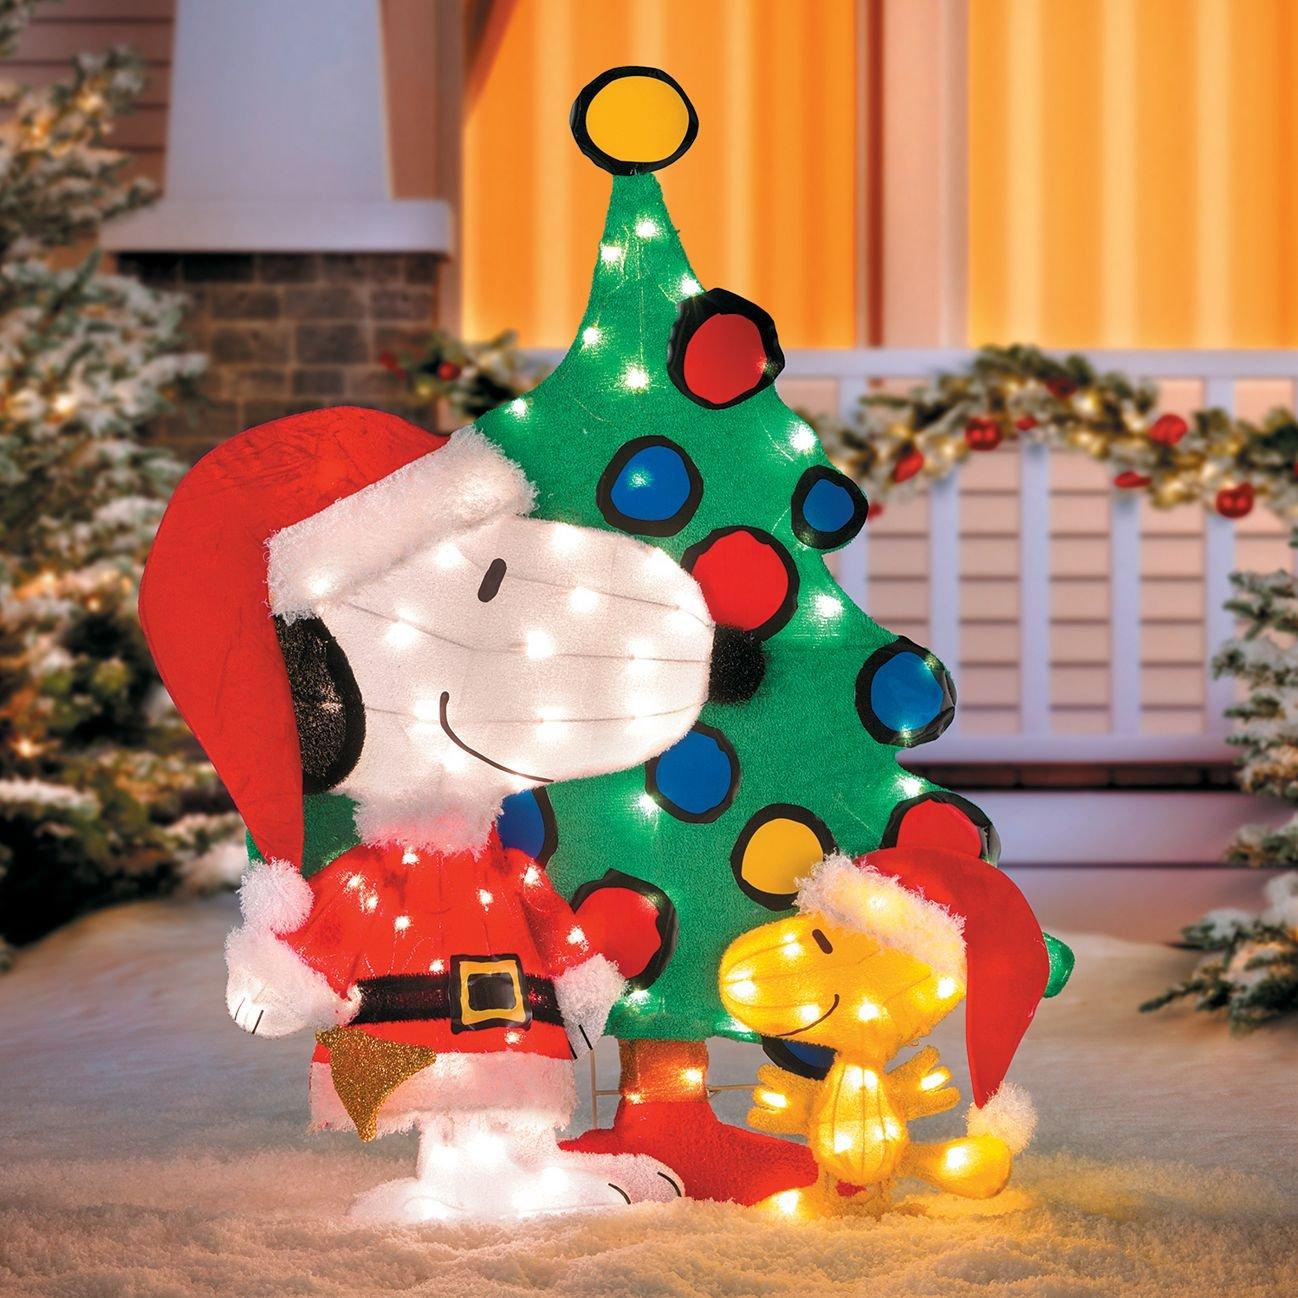 peanuts snoopy and woodstock christmas yard decoration santa set outdoor indoors - Peanuts Indoor Christmas Decorations